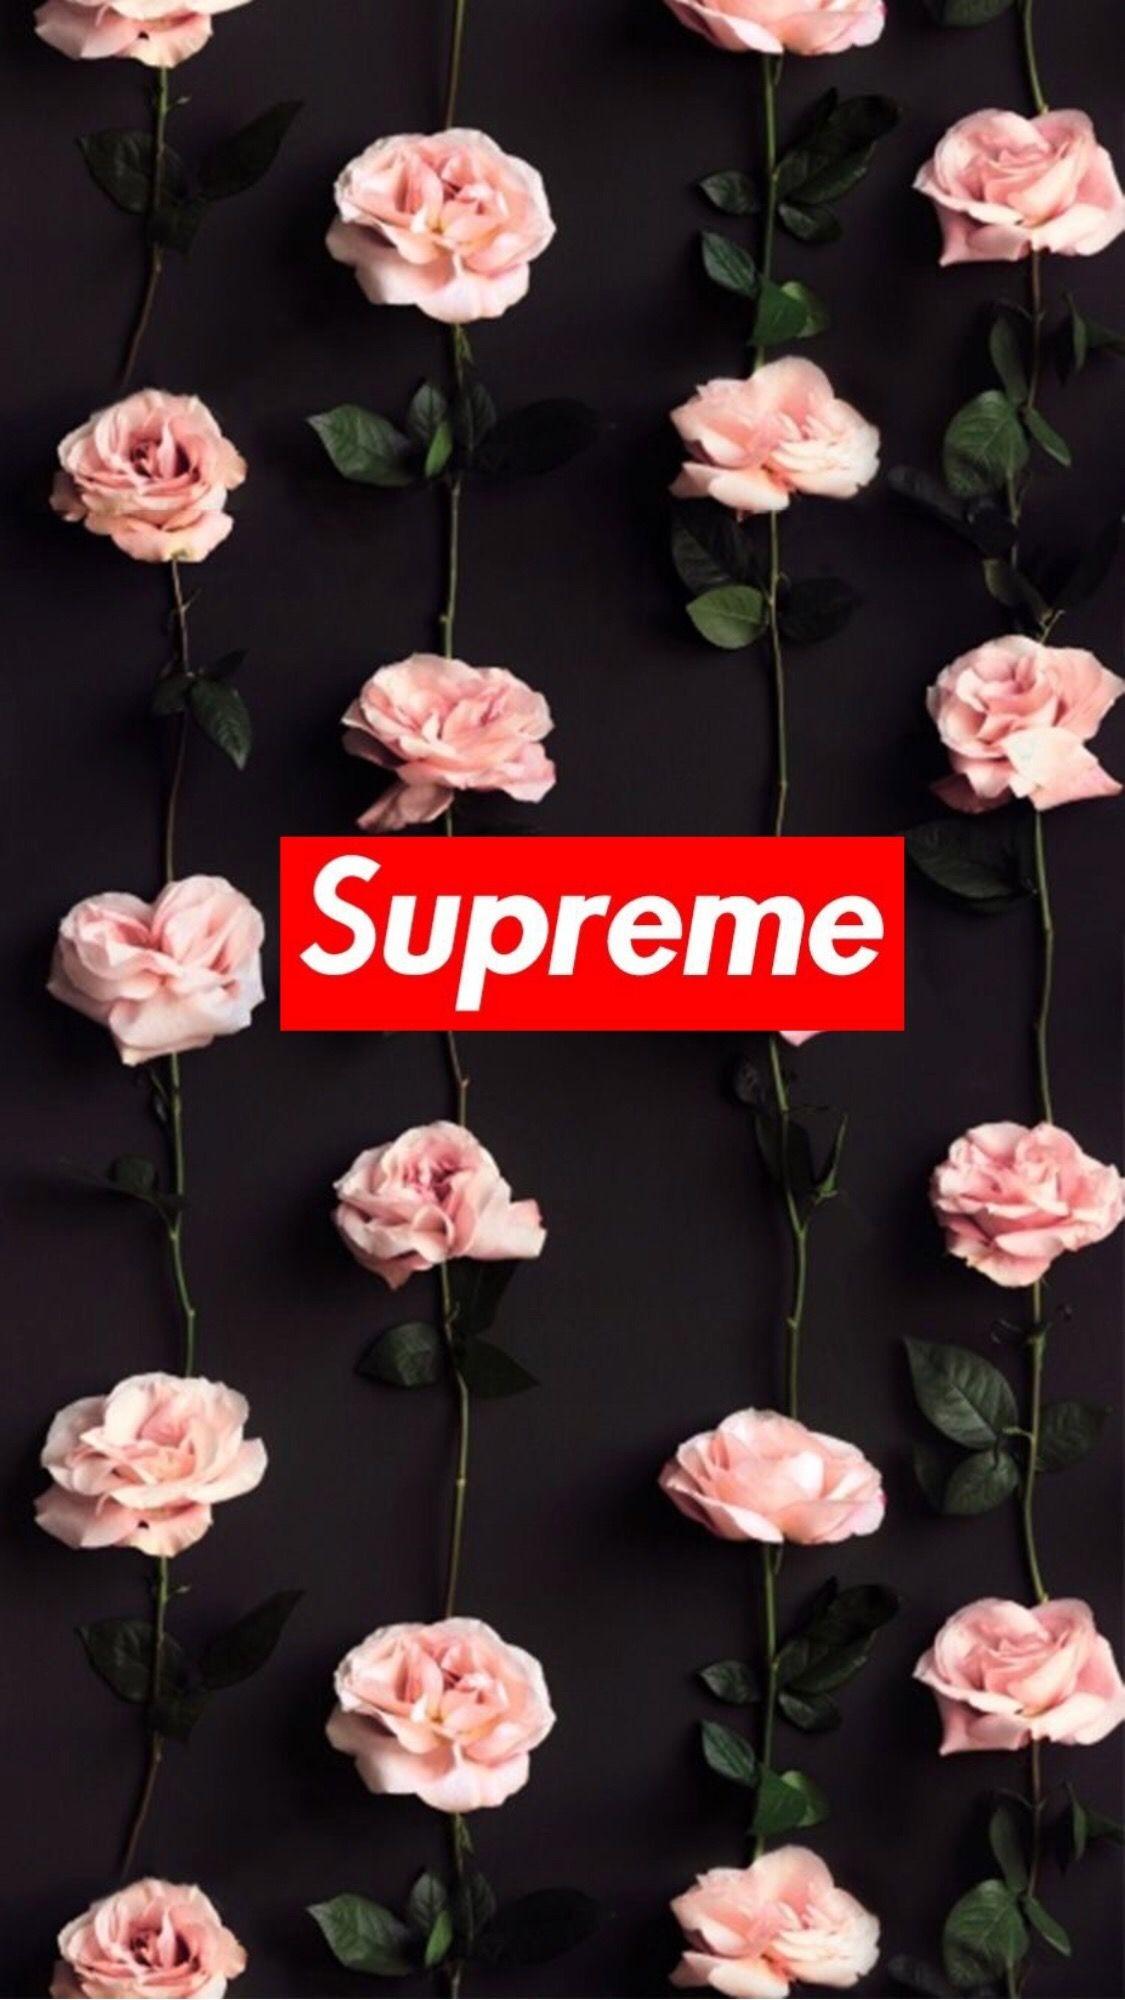 1125x2000, Wallpaper Supreme   Data Id 1681   Data - Supreme Wallpaper Pink - HD Wallpaper